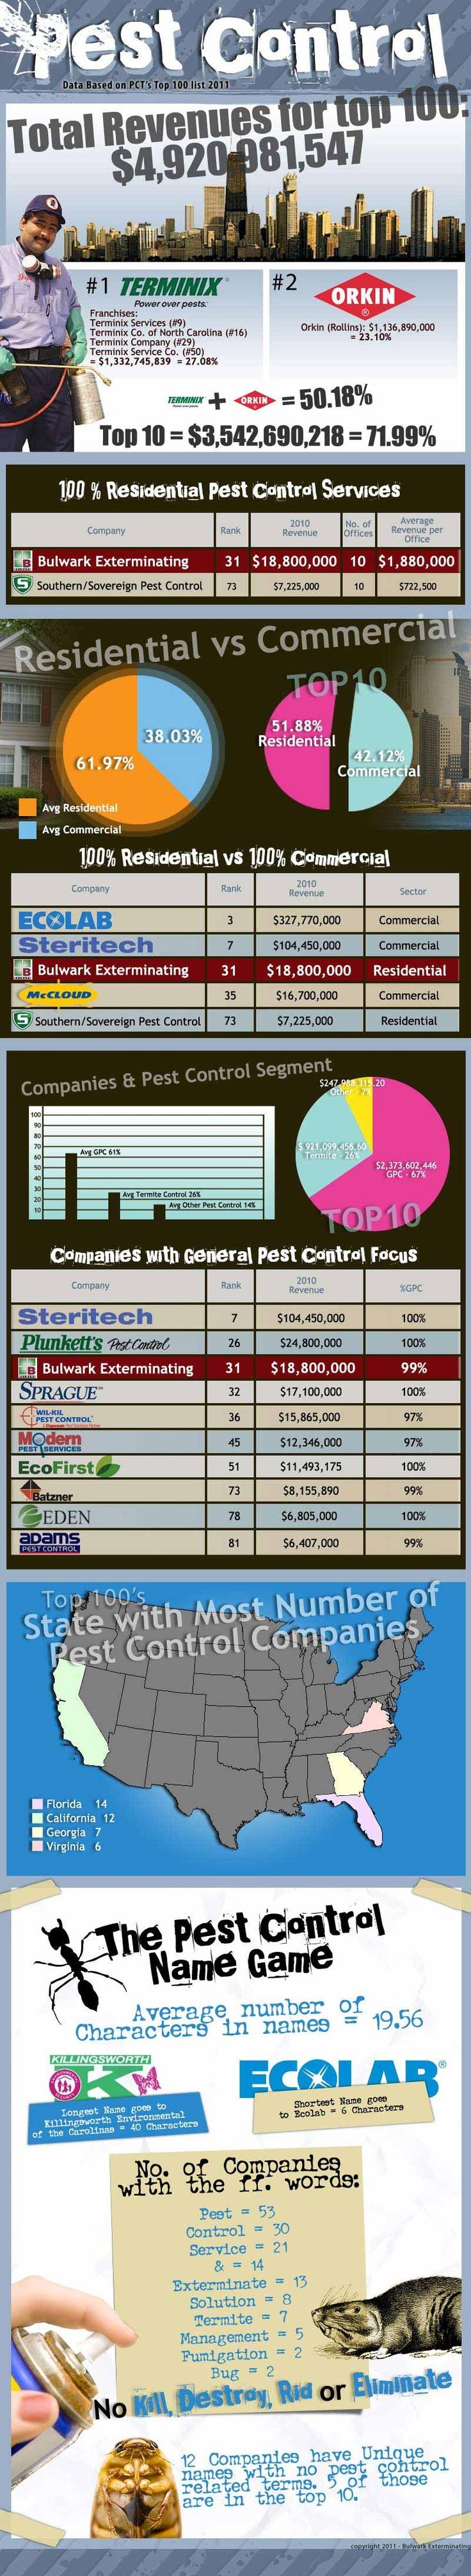 Top 100 Pest Control Companies – http://www.avonpestcontrol.ca/